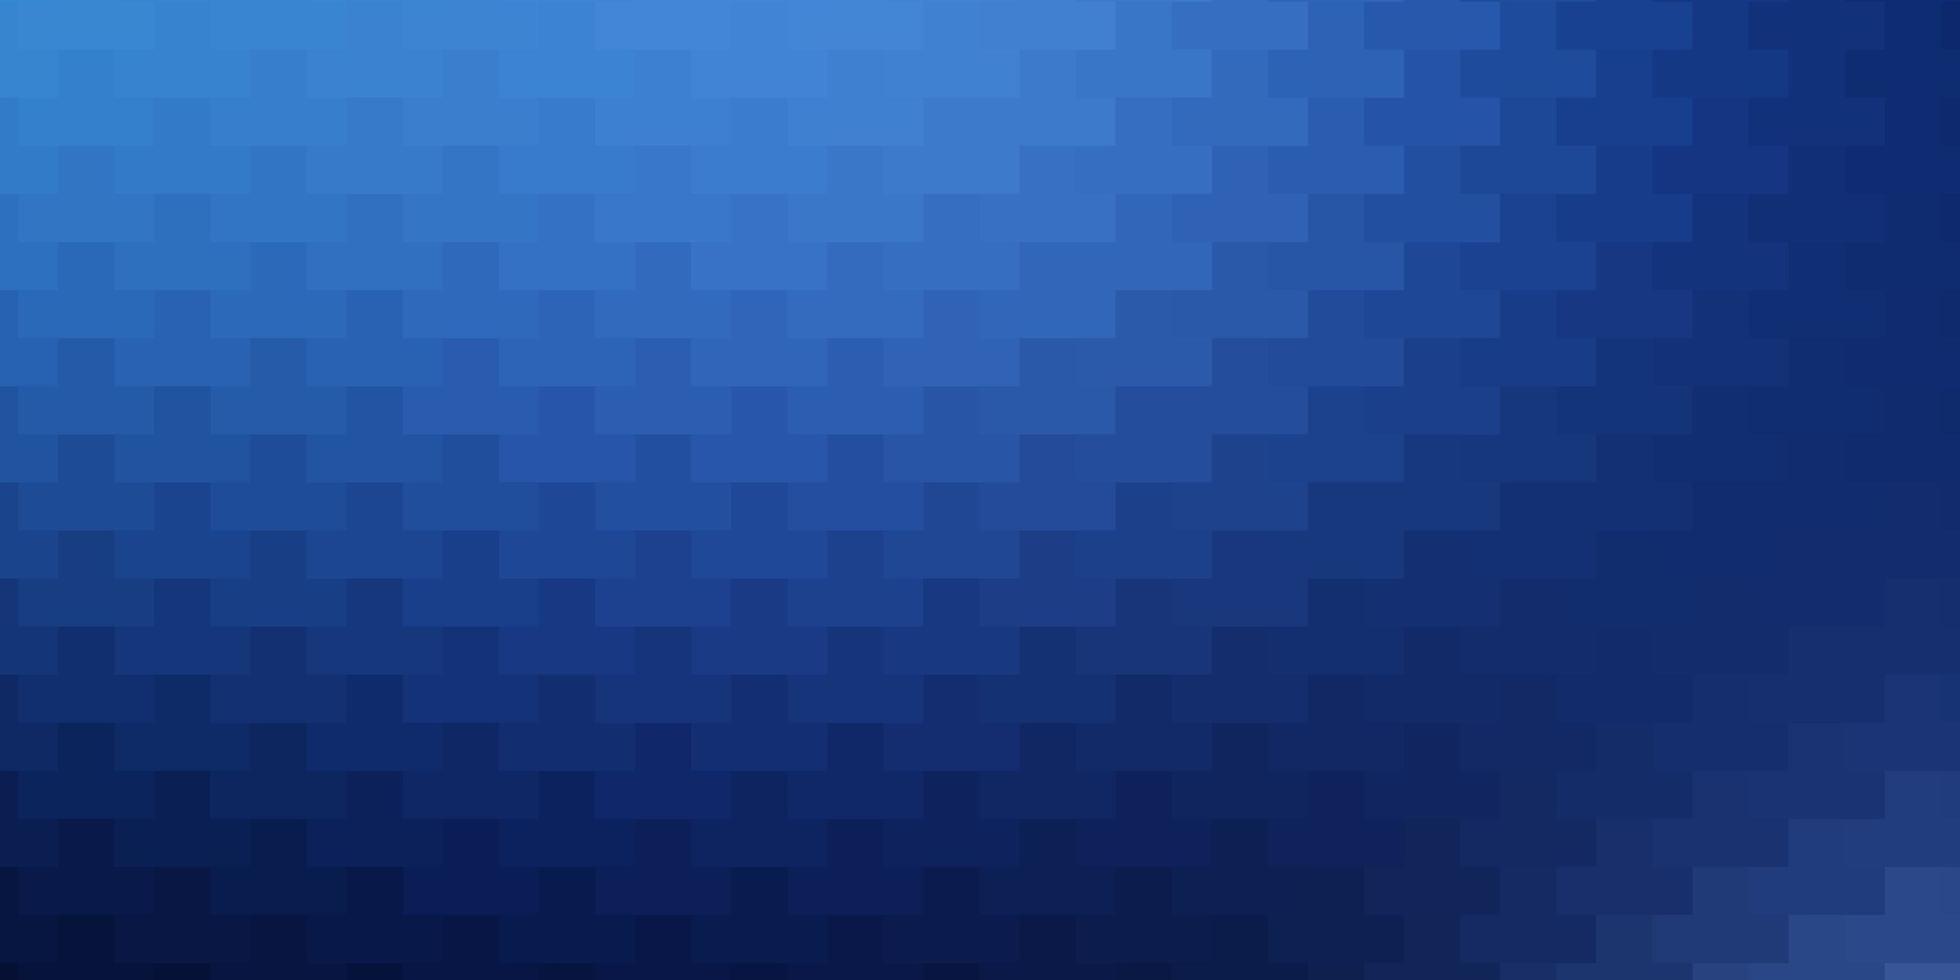 dunkelblaue Vektorbeschaffenheit im rechteckigen Stil. vektor